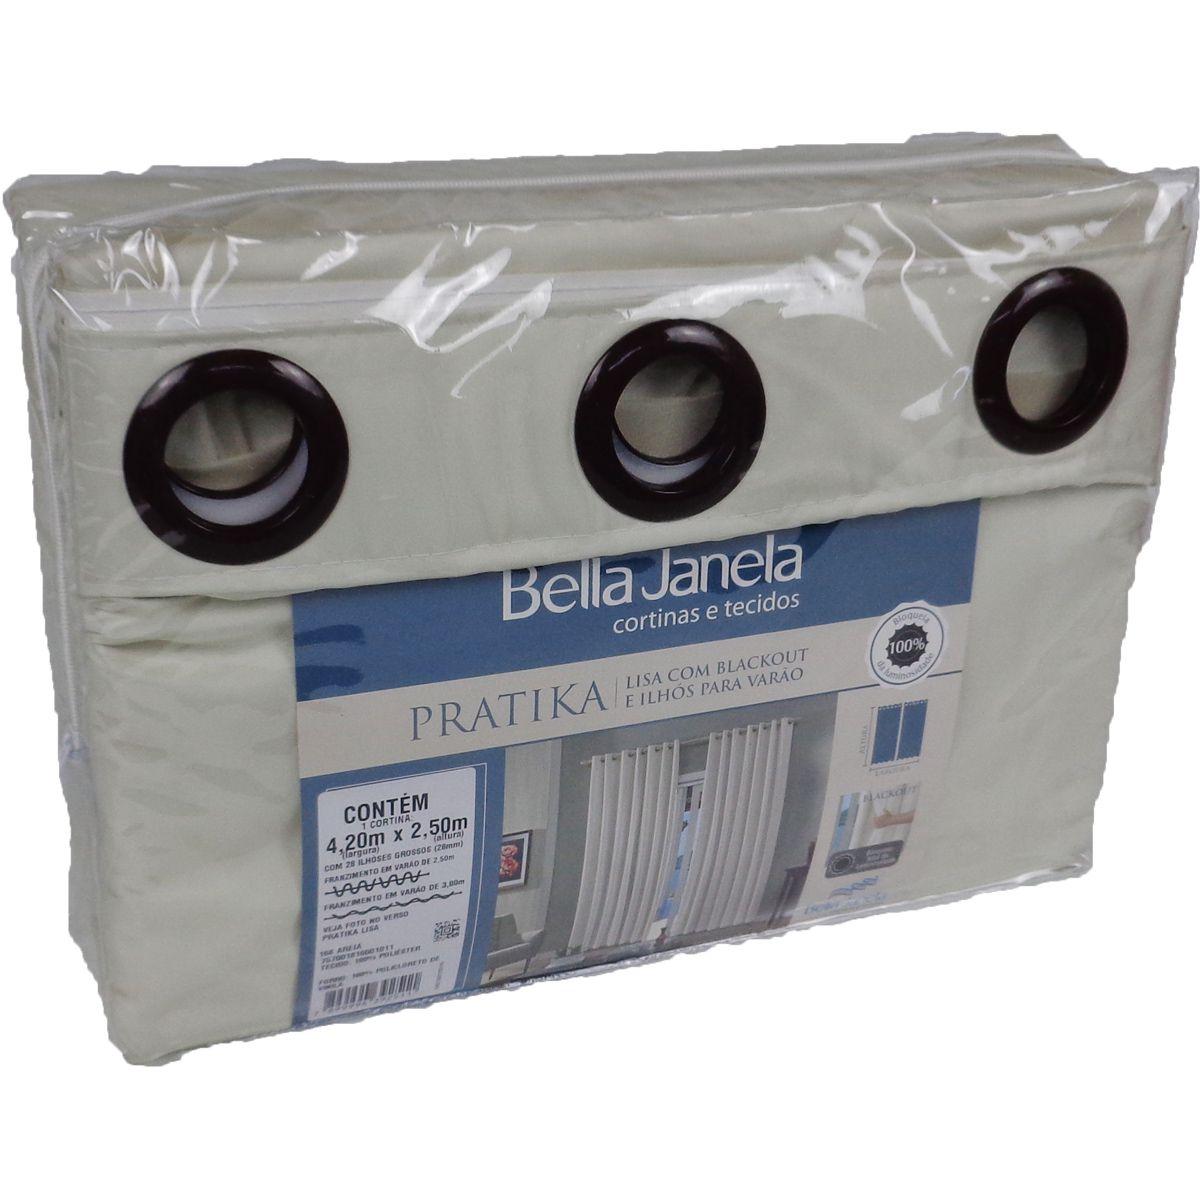 Cortina Blackout Areia Pratika Lisa Slim 4,20 X 2,50 Bella Janela